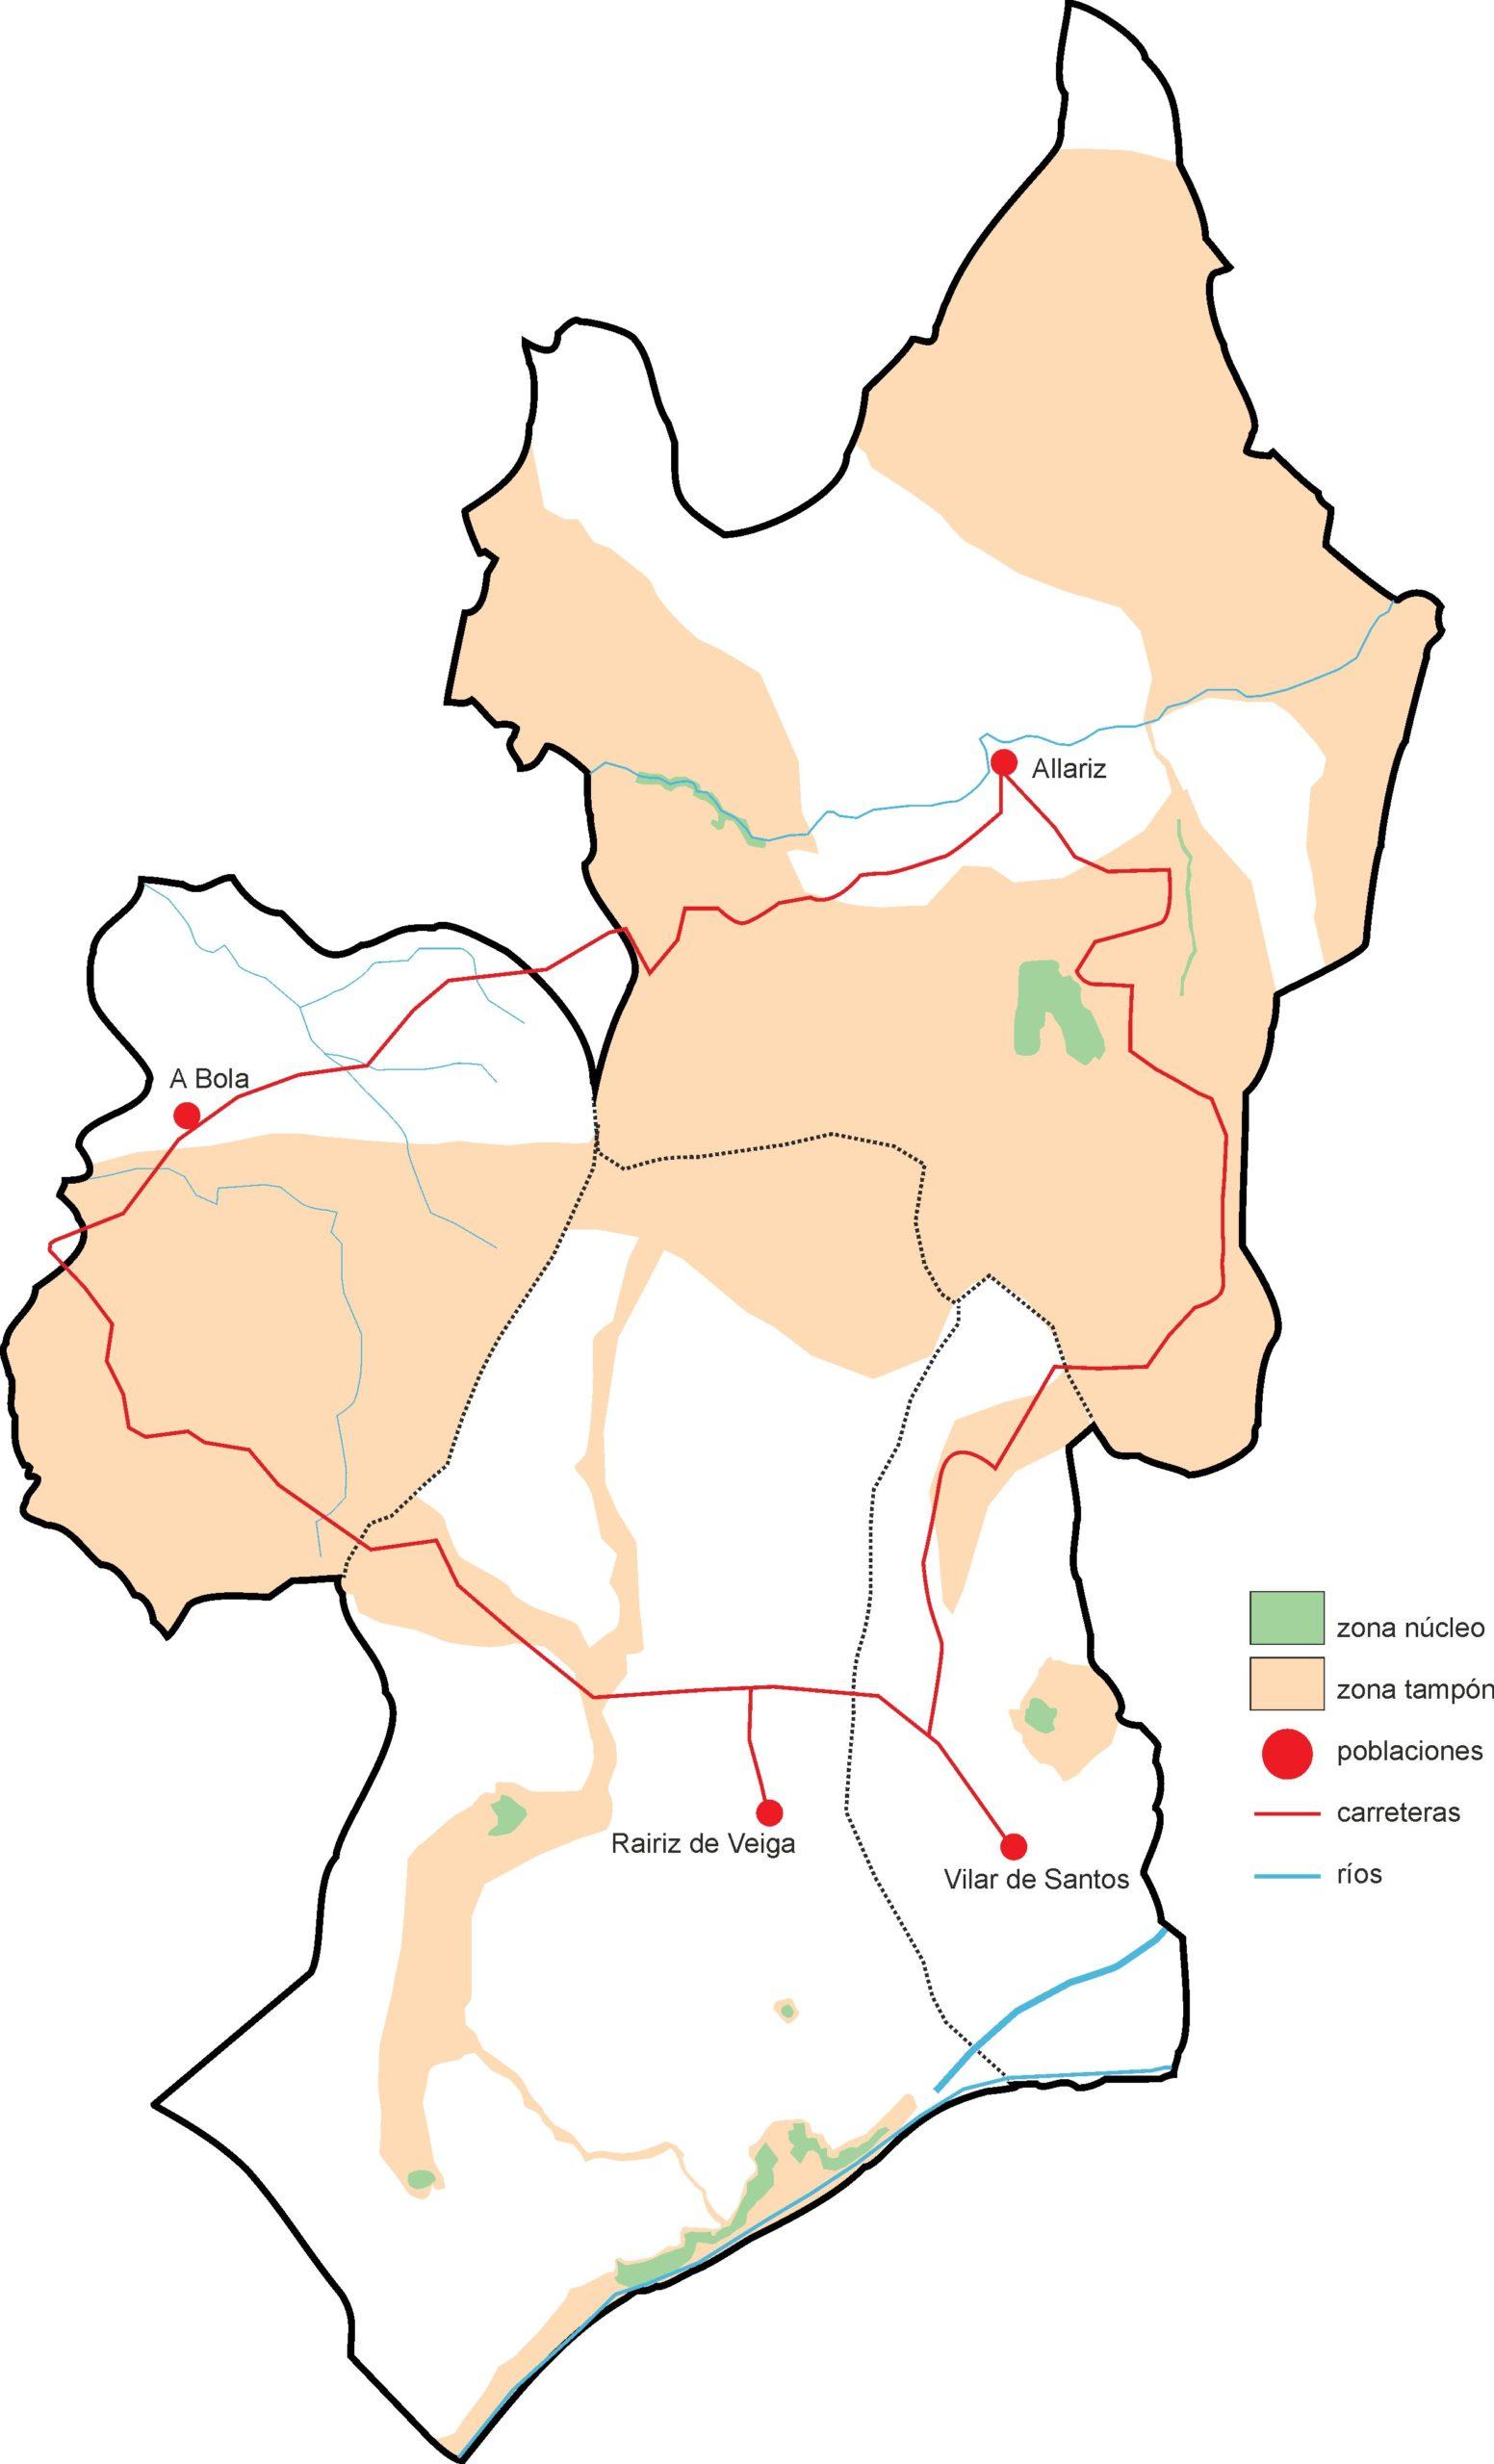 Mapa Reserva Biosfera Area de Allariz